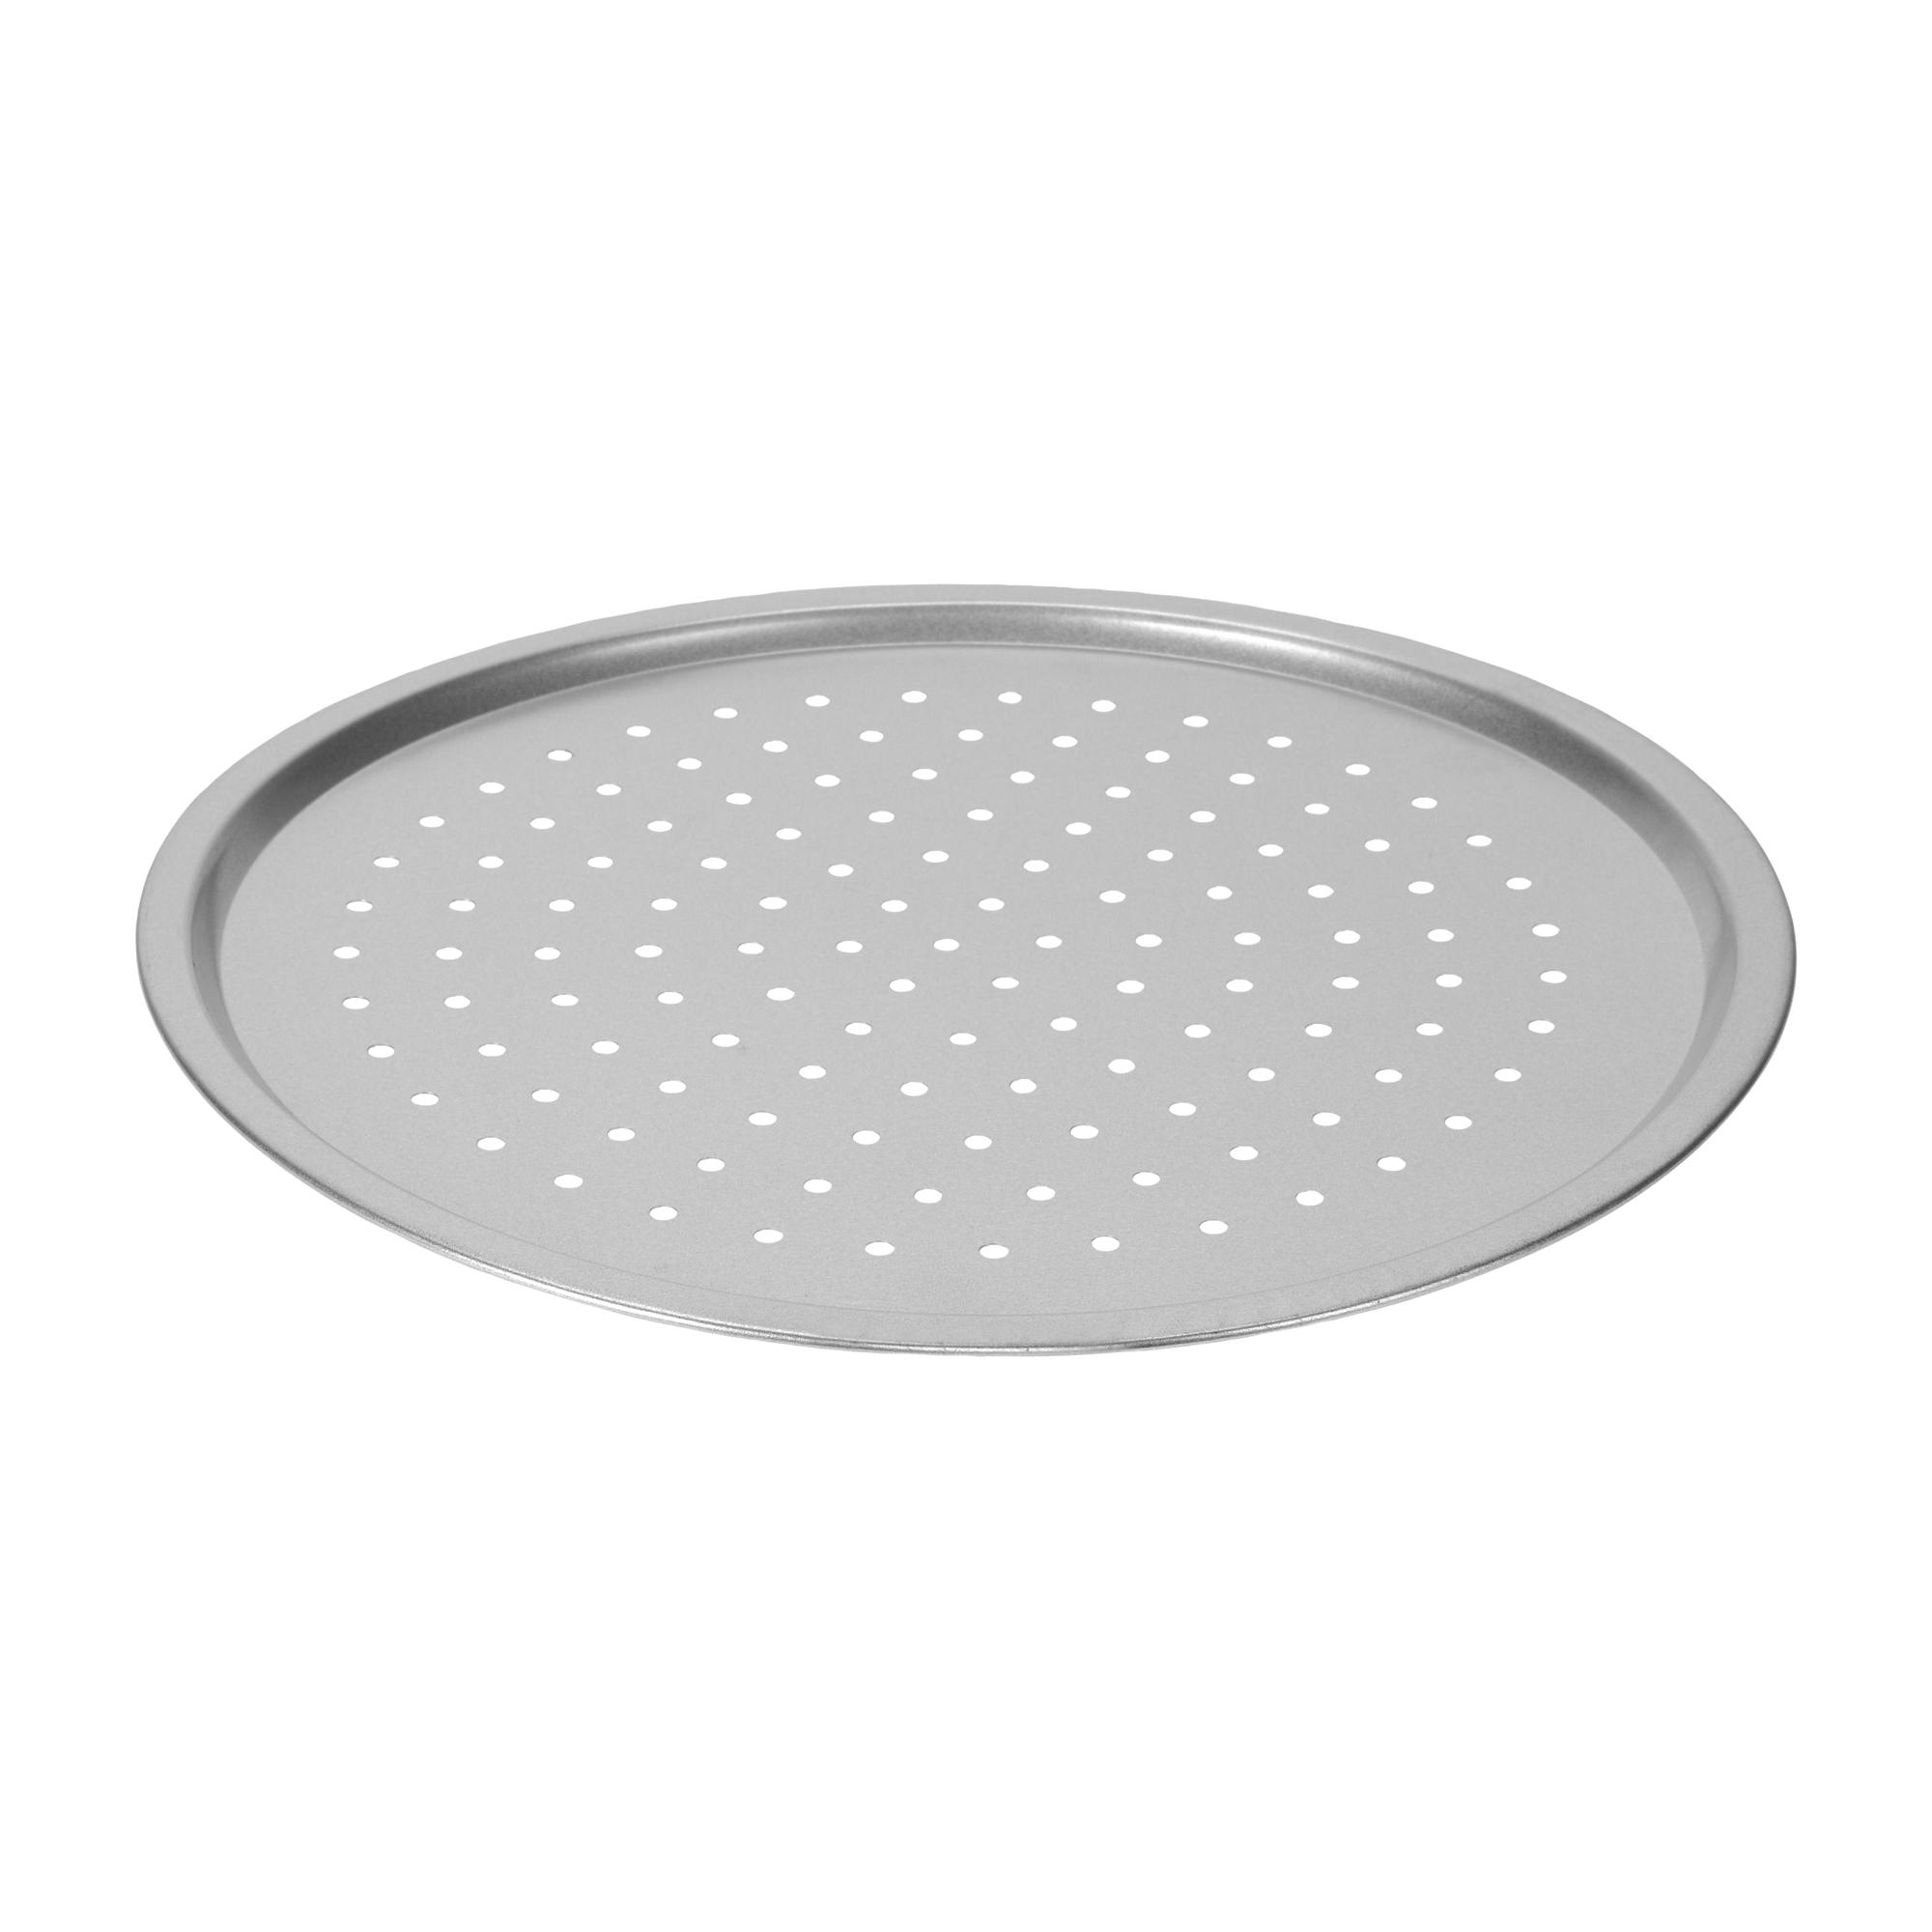 Форма для выпекания Koopman tableware 33 см форма для выпекания металл frittori esf 26 26х7см